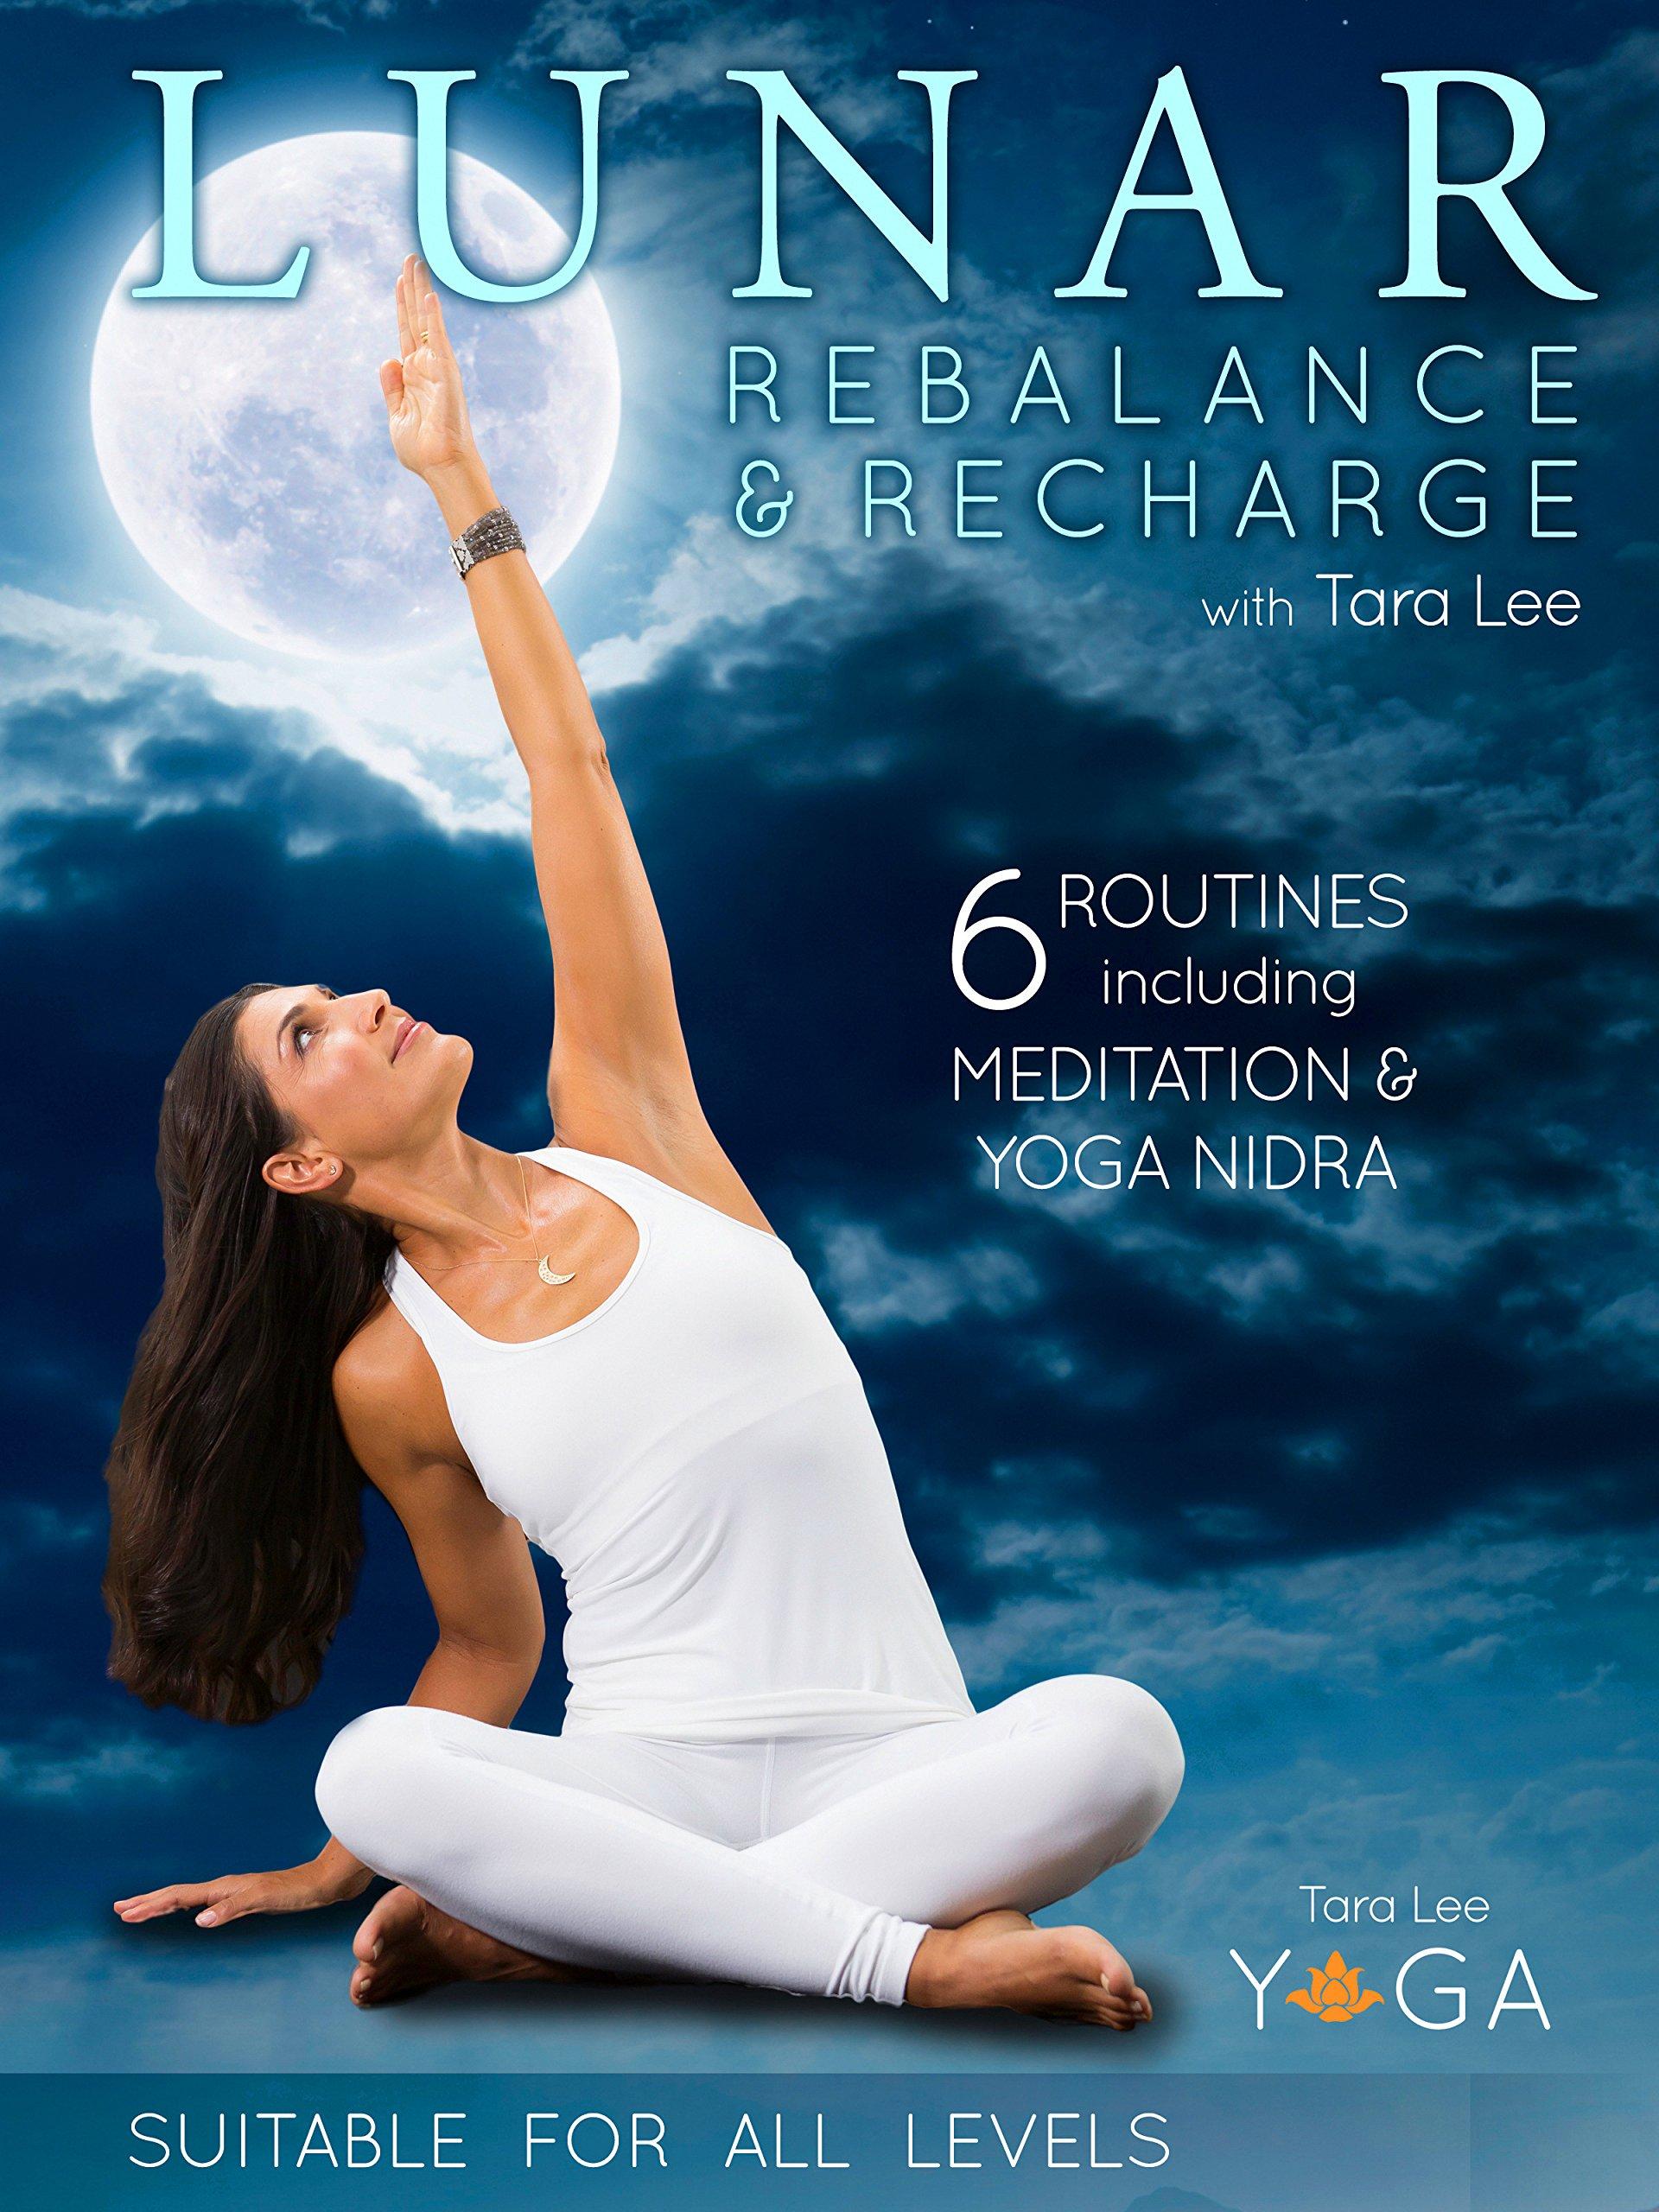 Lunar: Rebalance & Recharge Yoga with Tara Lee